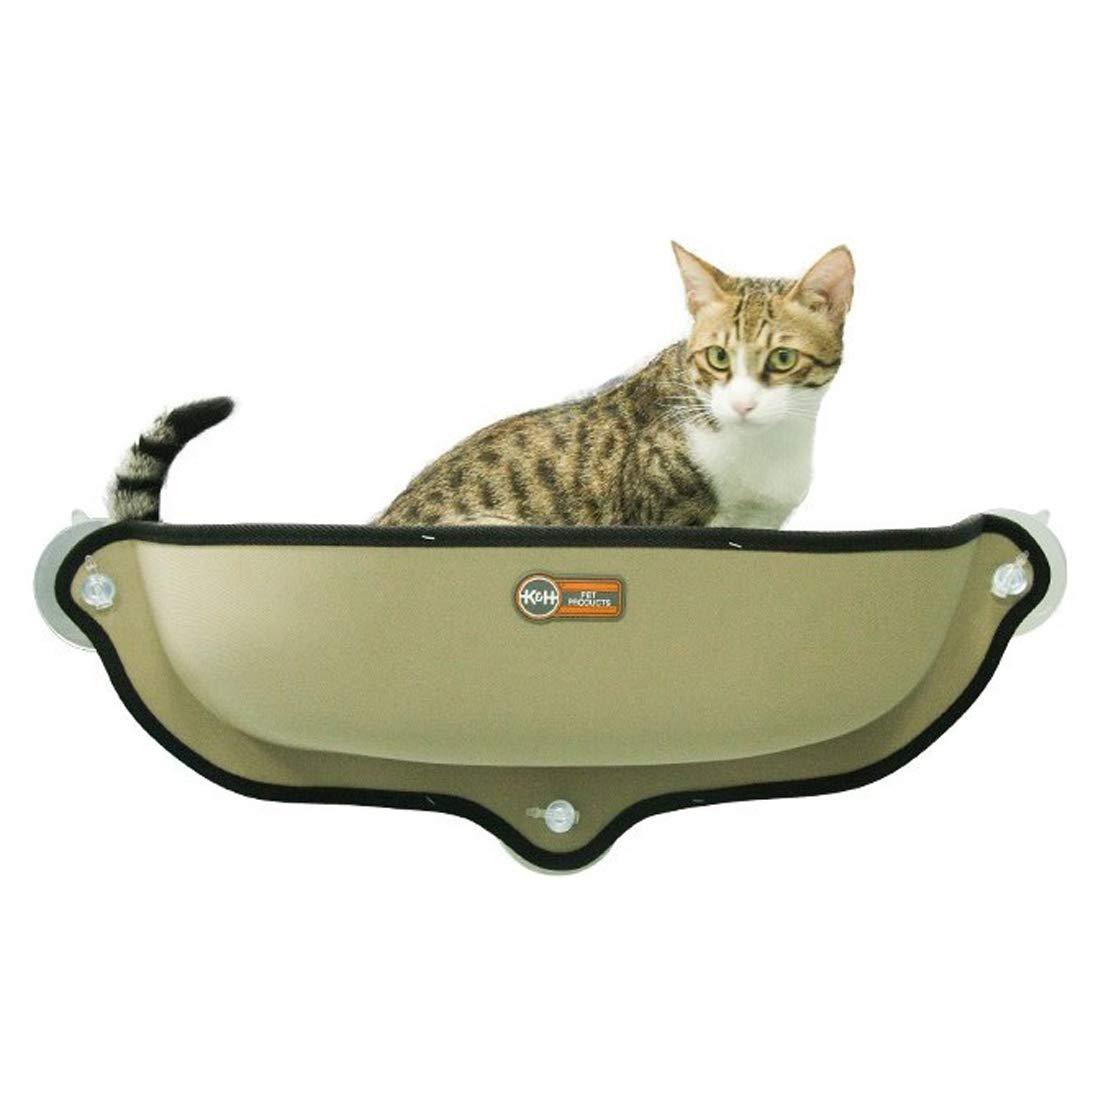 B Window Cat Bed Sunbathing Semi-Closed Deep Sleep Fossa Sunbathing Cat Mat Cat Hammock Cat Sunbathing + Daydreaming 68 × 28CM Can Bear 15KG